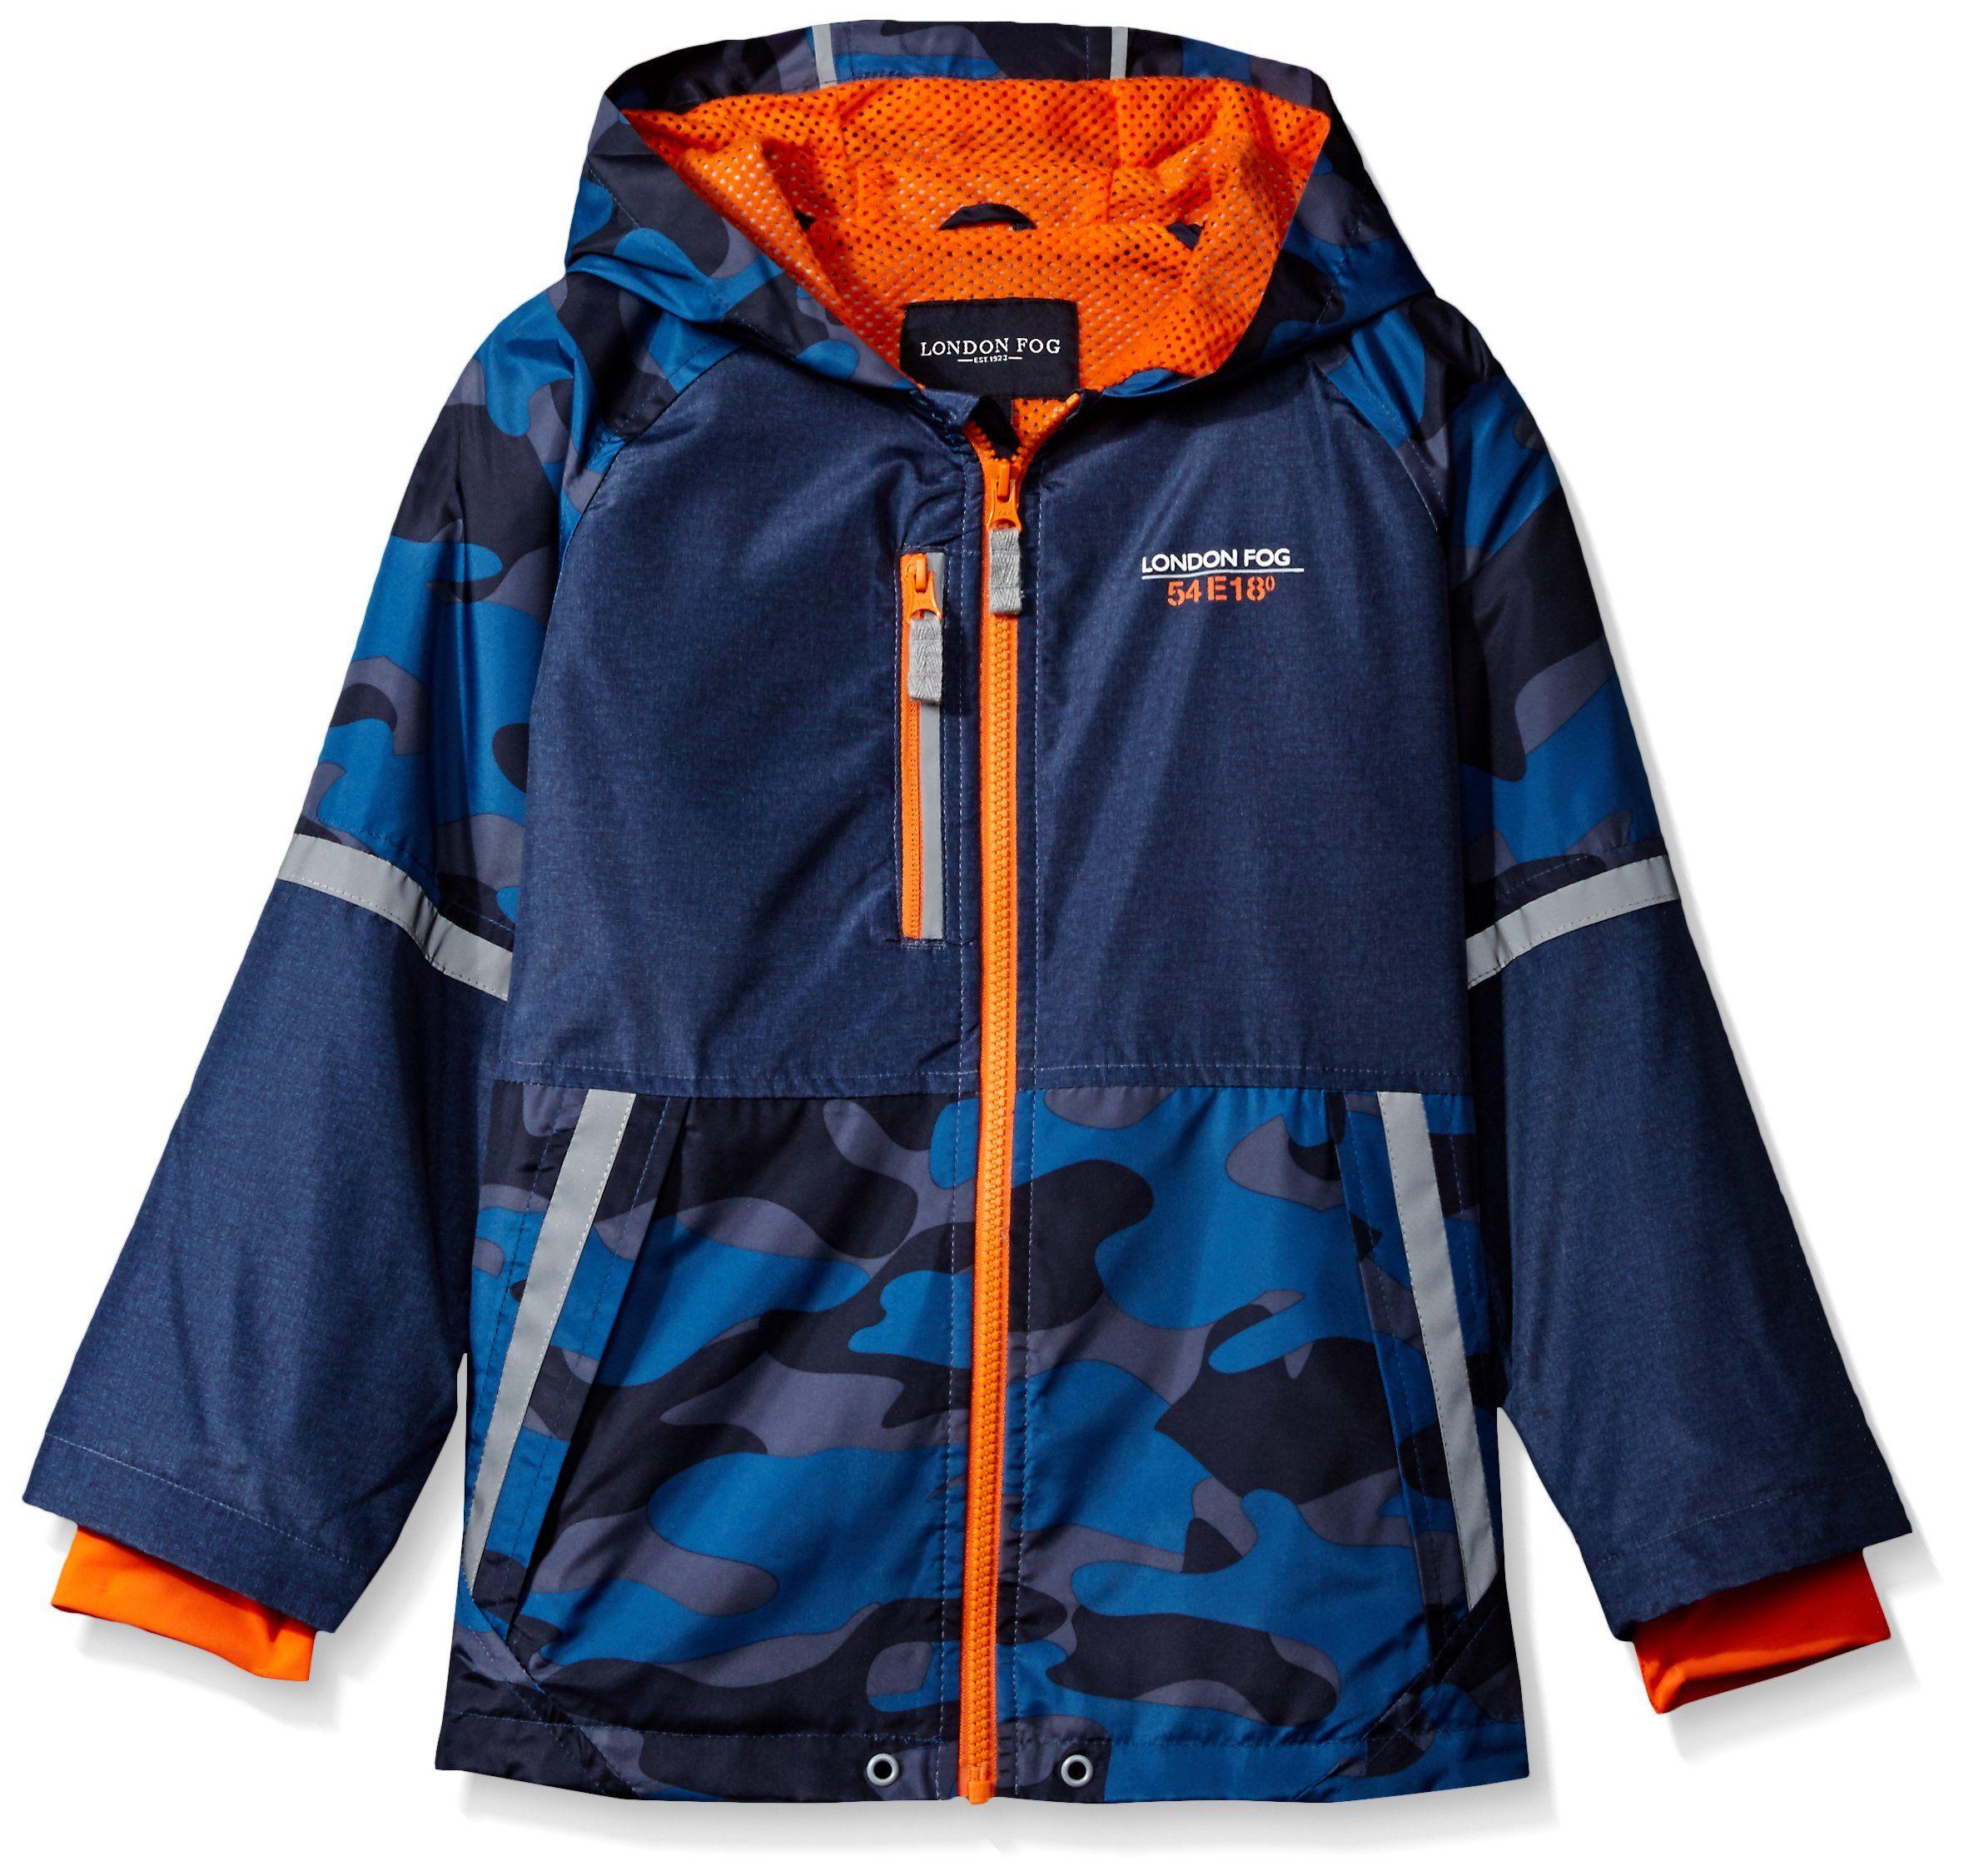 42d8648d7eea Amazon.com  London Fog Boys  Camouflage Print Jacket  Clothing ...